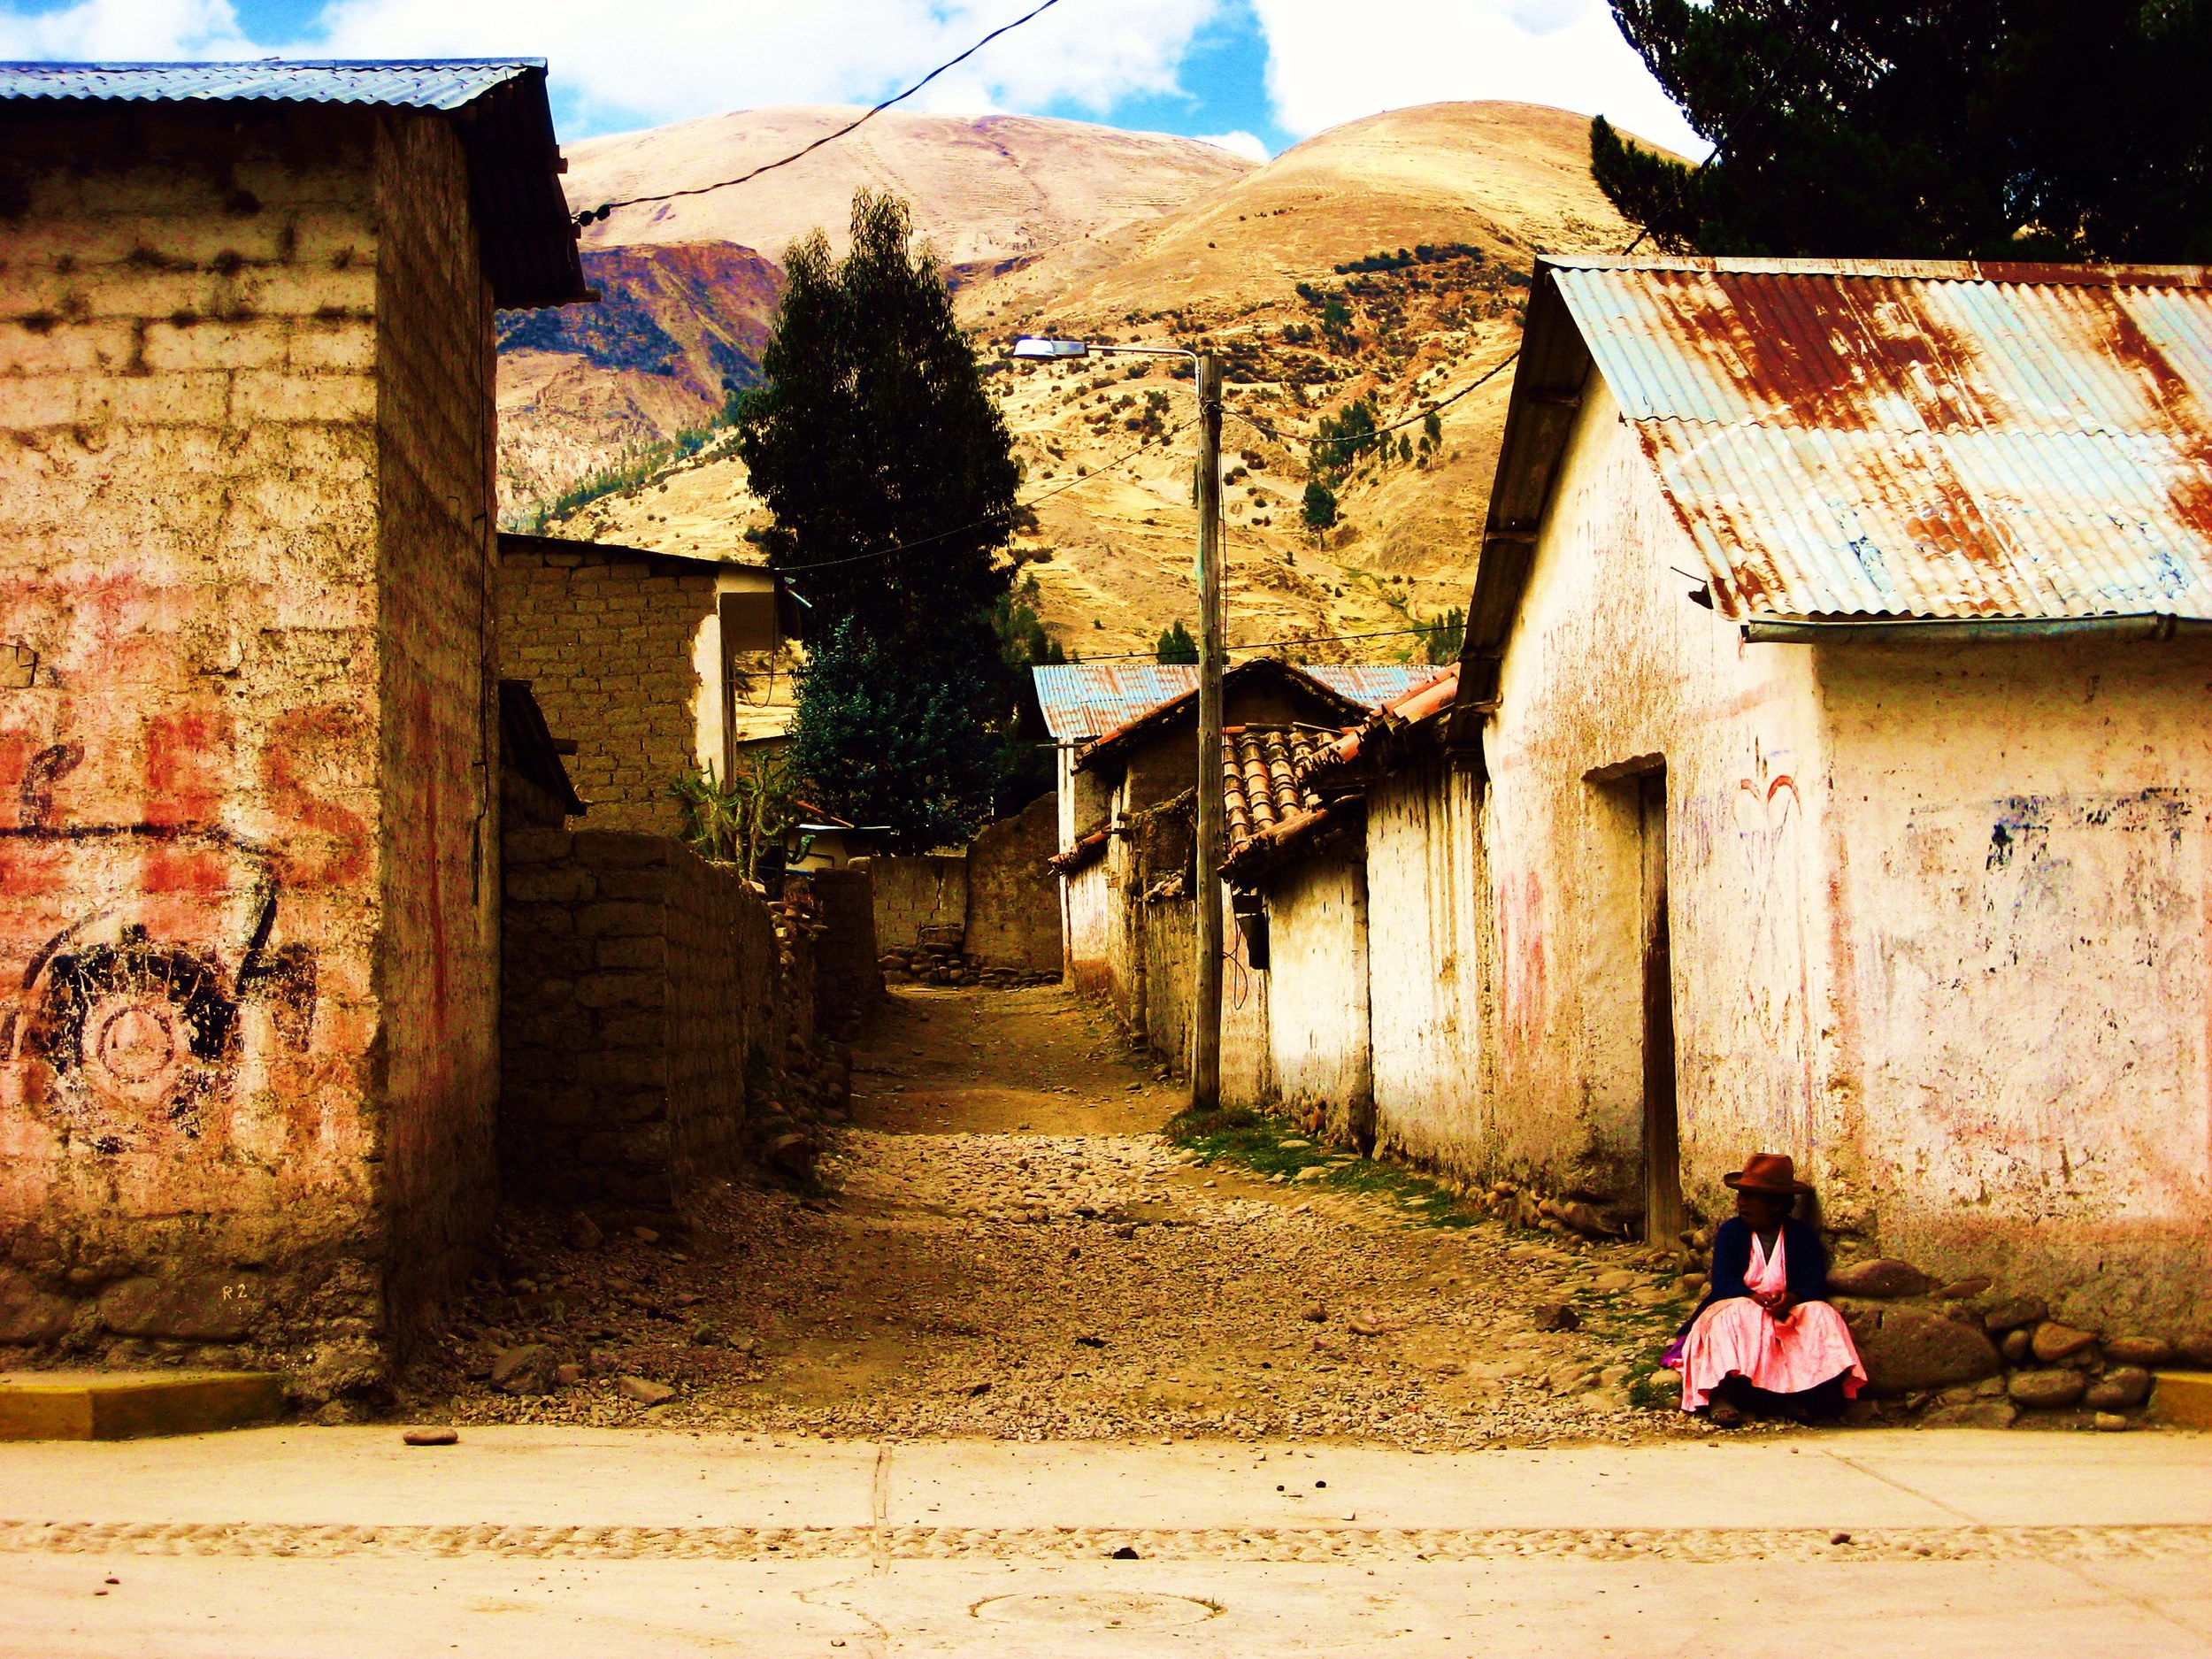 mujer en falda rosada bright.jpg